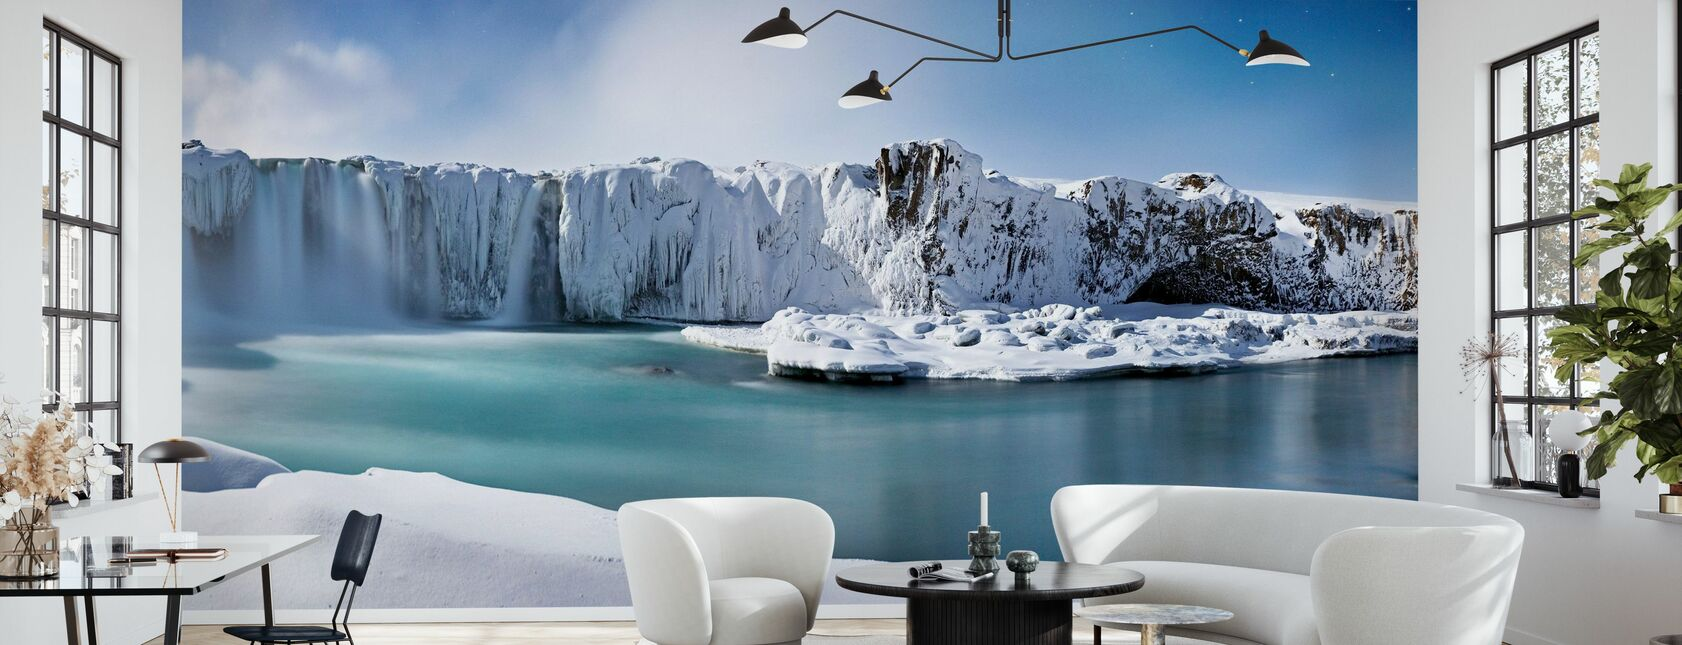 Godafoss Waterfalls - Wallpaper - Living Room